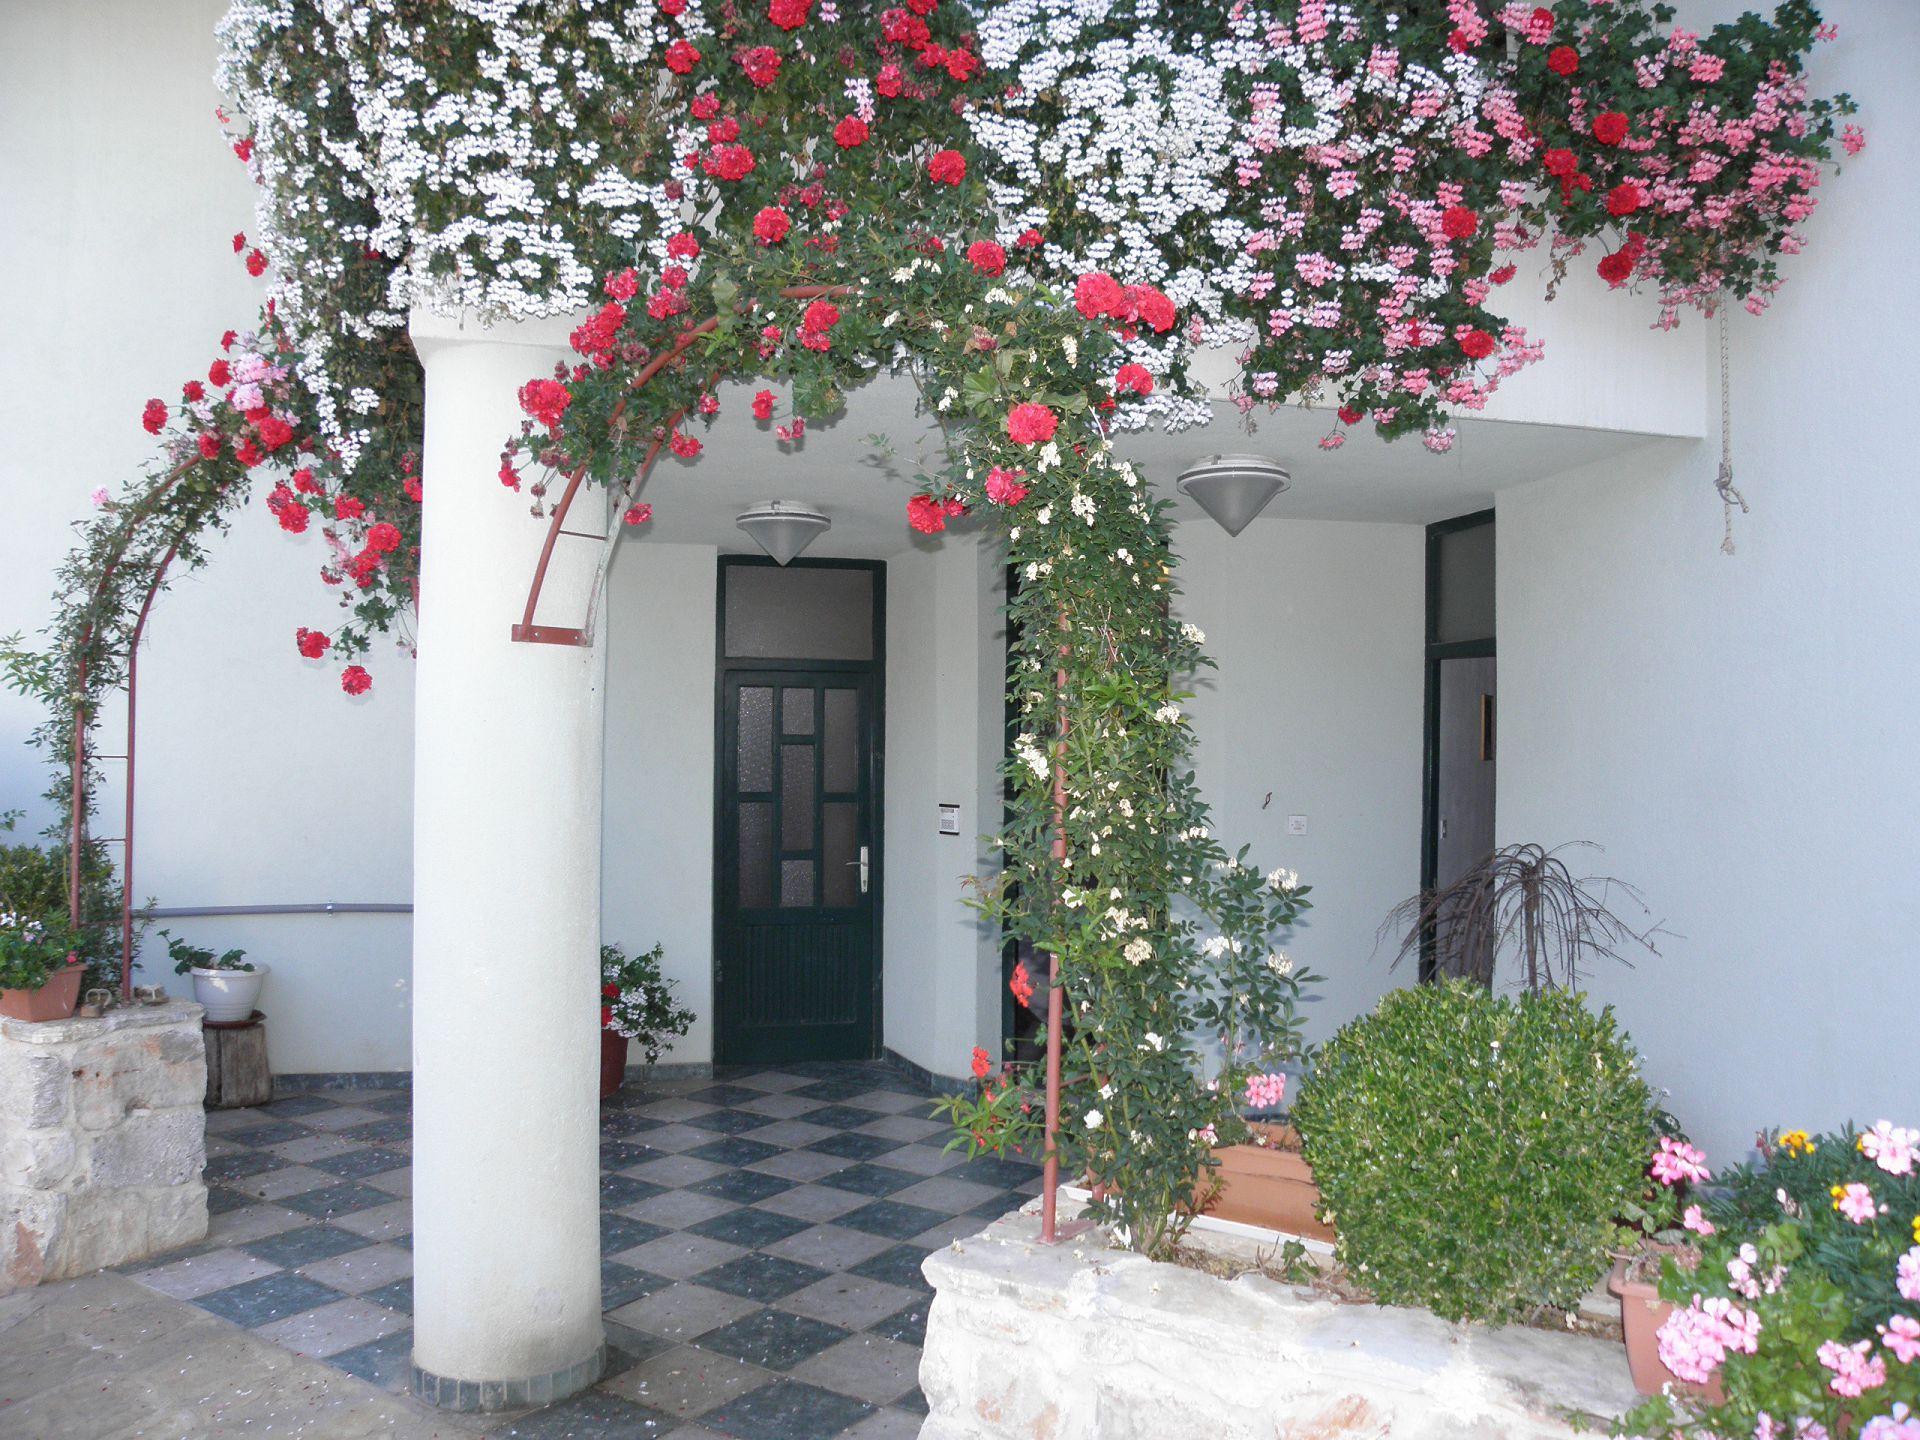 Ferienwohnung Novis A2 Lucia (2+1) - Kali (743269), Kali, Insel Ugljan, Dalmatien, Kroatien, Bild 4